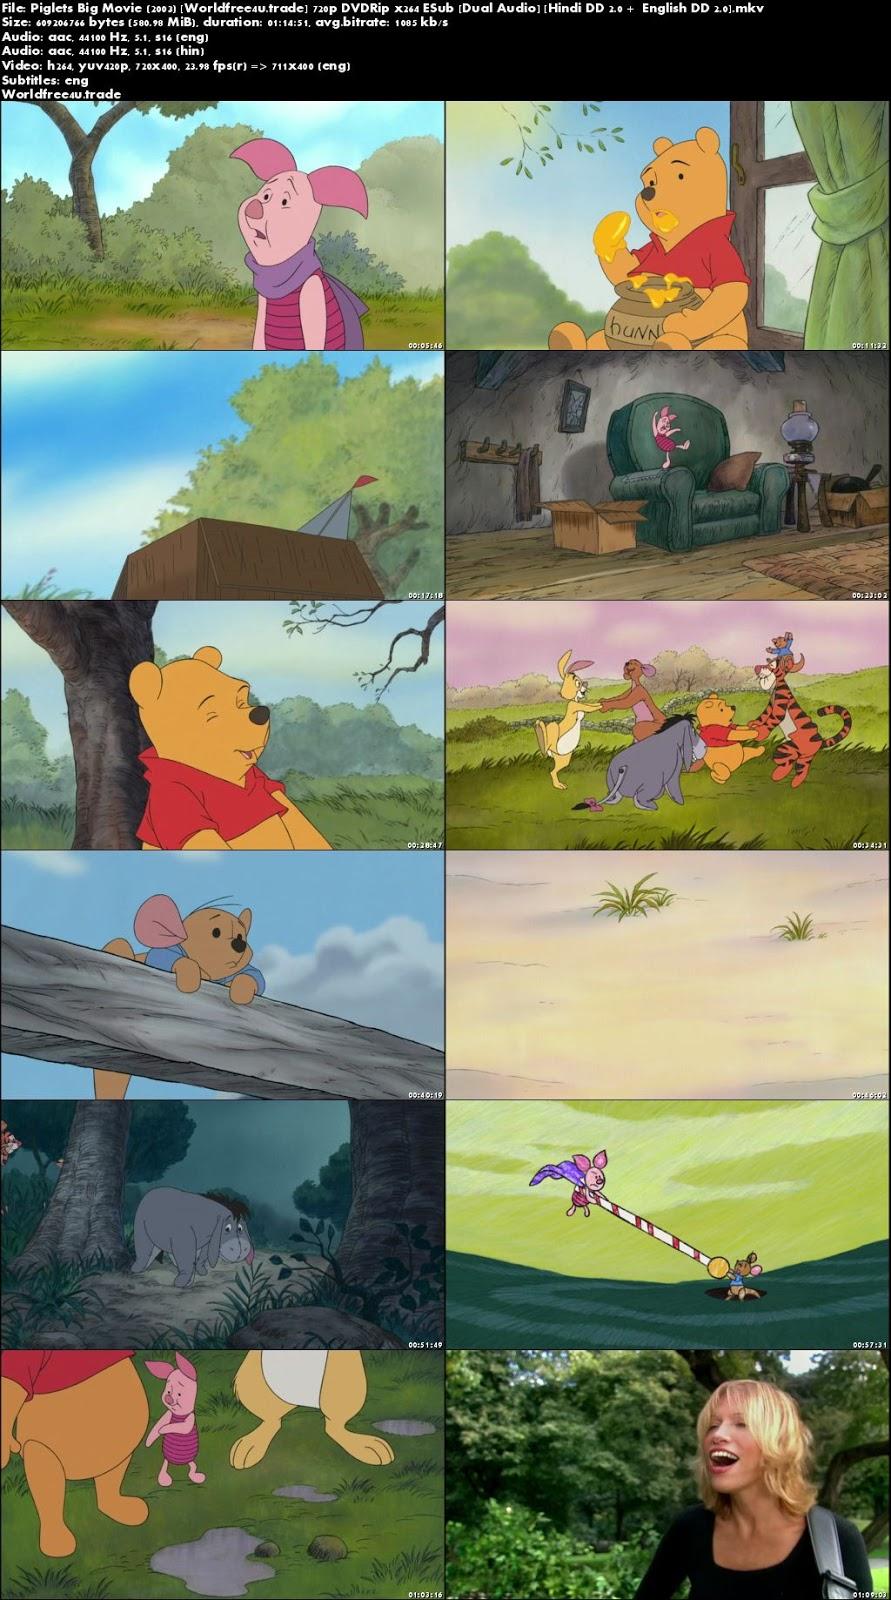 Piglet's big movie (2003) full movie™ hd 1080p video dailymotion.